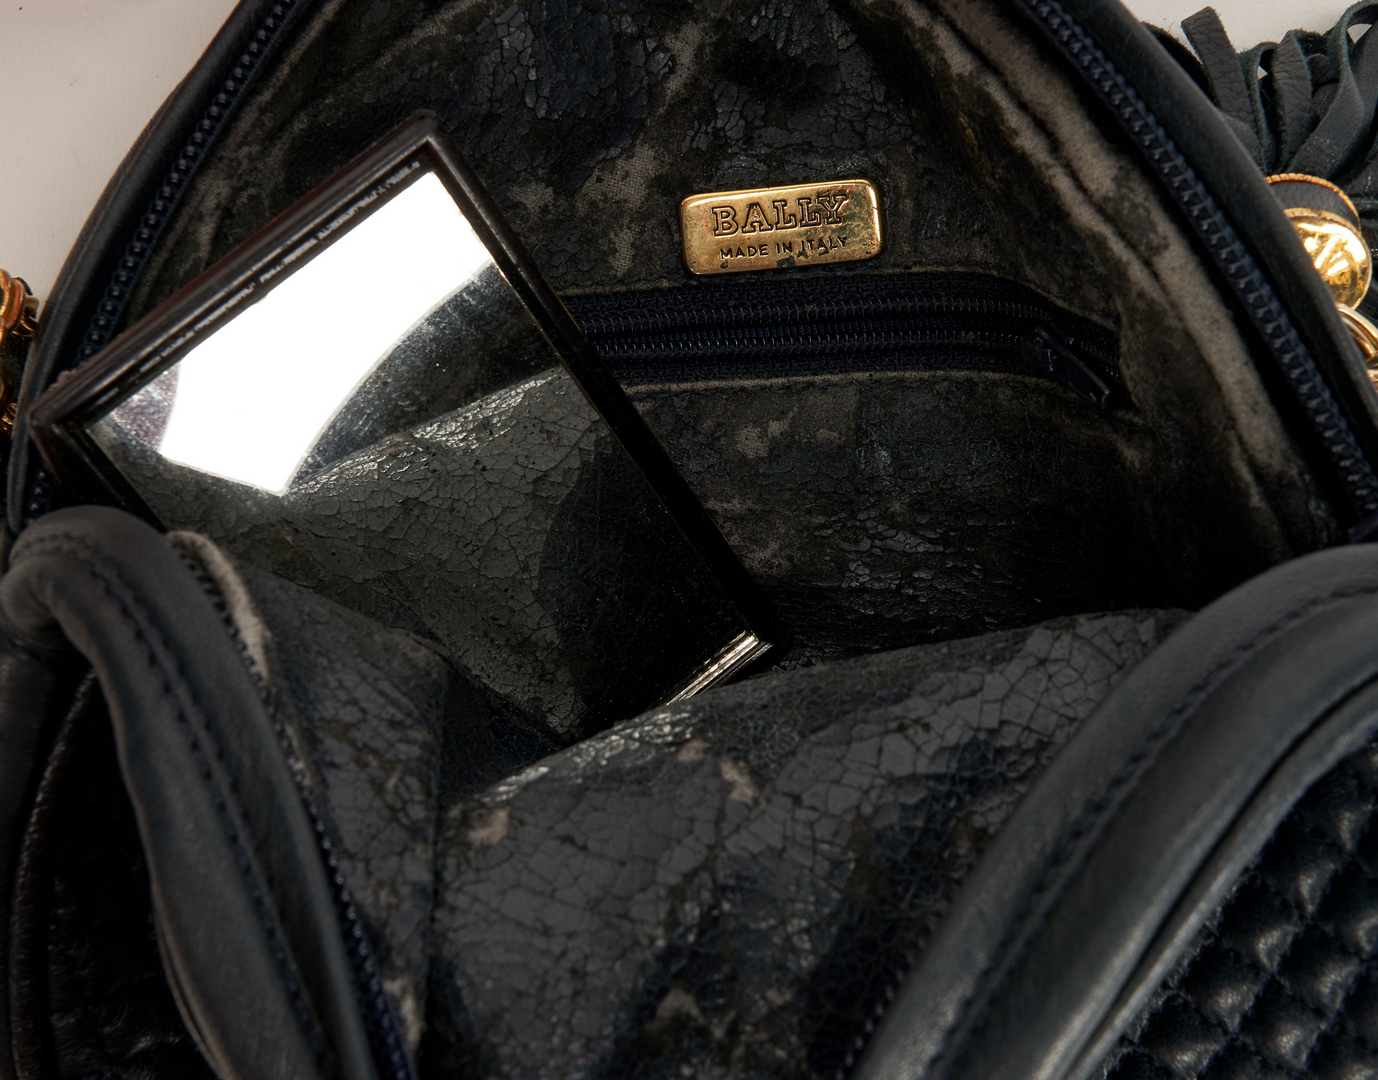 Lot 713: 6 Designer Handbags, incl. Bottega Veneta, Salvatore Ferragamo